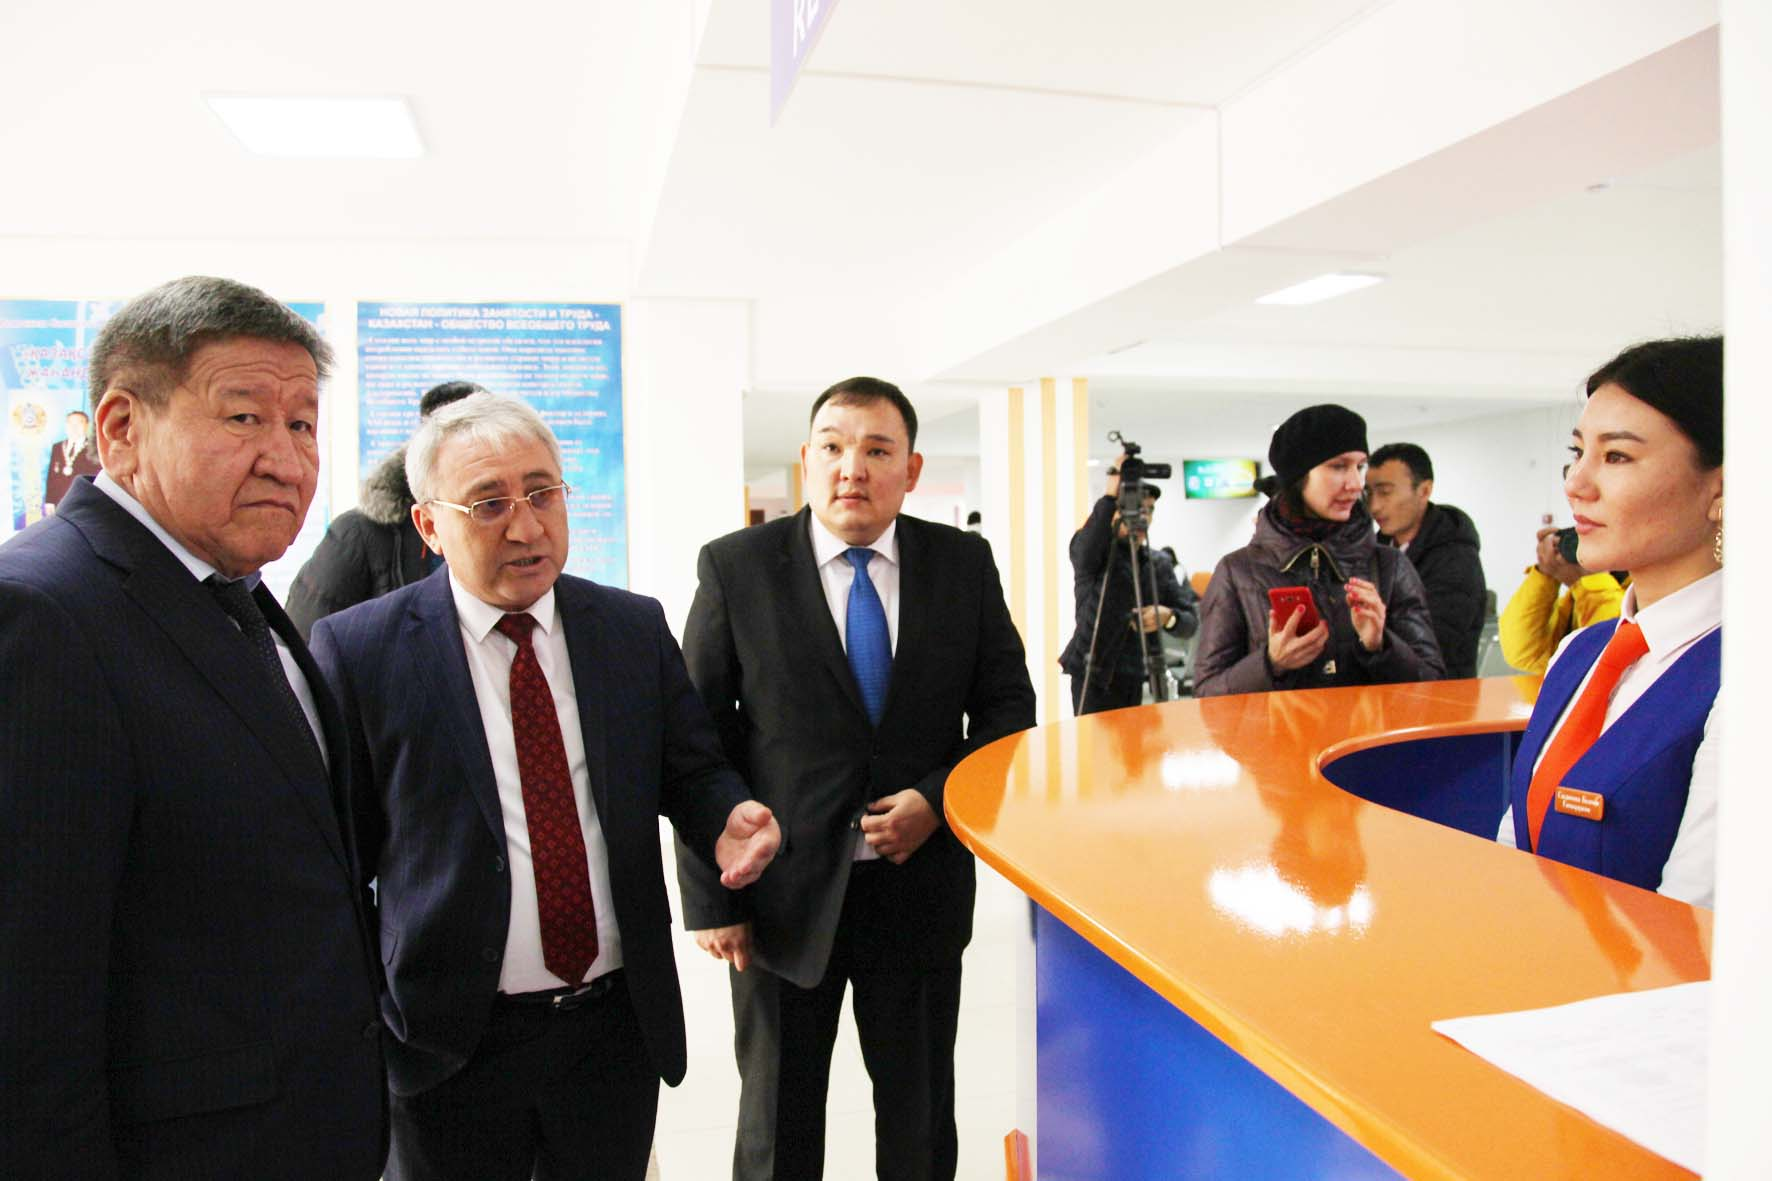 Центр занятости города талдыкорган фото будет